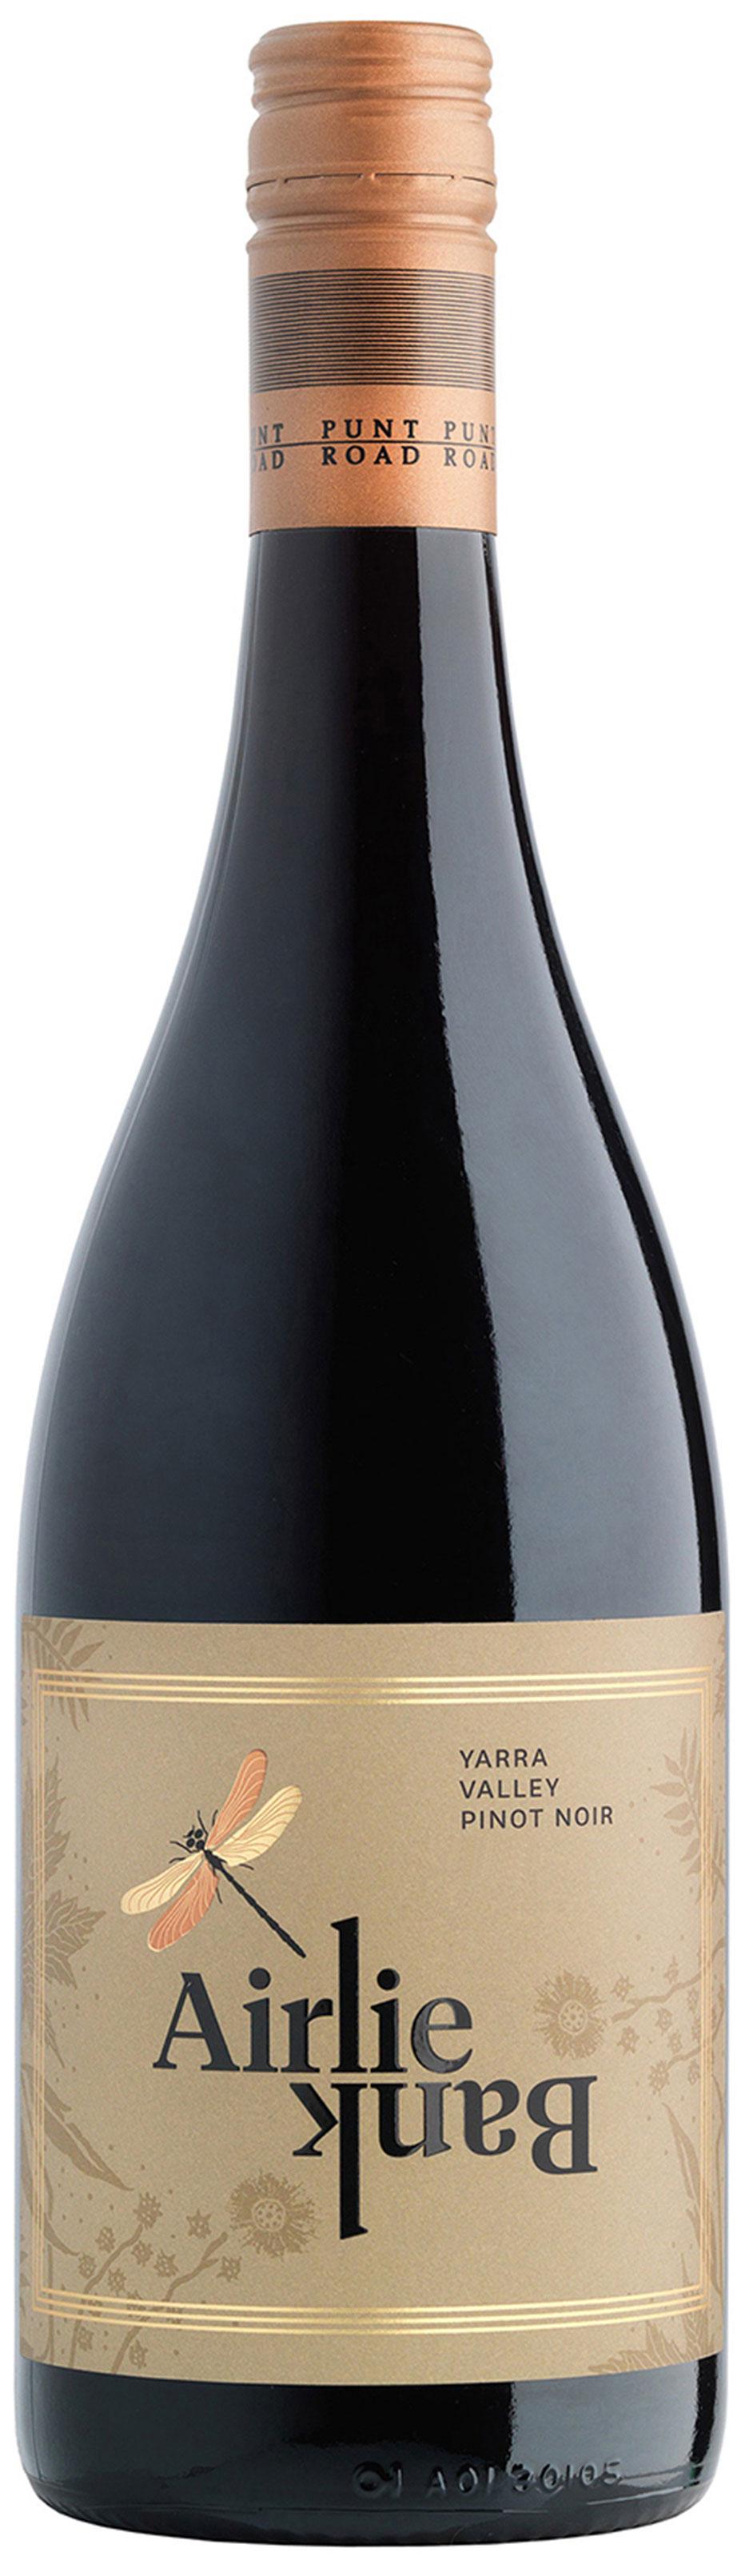 https://vinocorpperu.com/images/vinos/puntroad/punt_road_airlie_bank_pinot_noir_2017.jpg